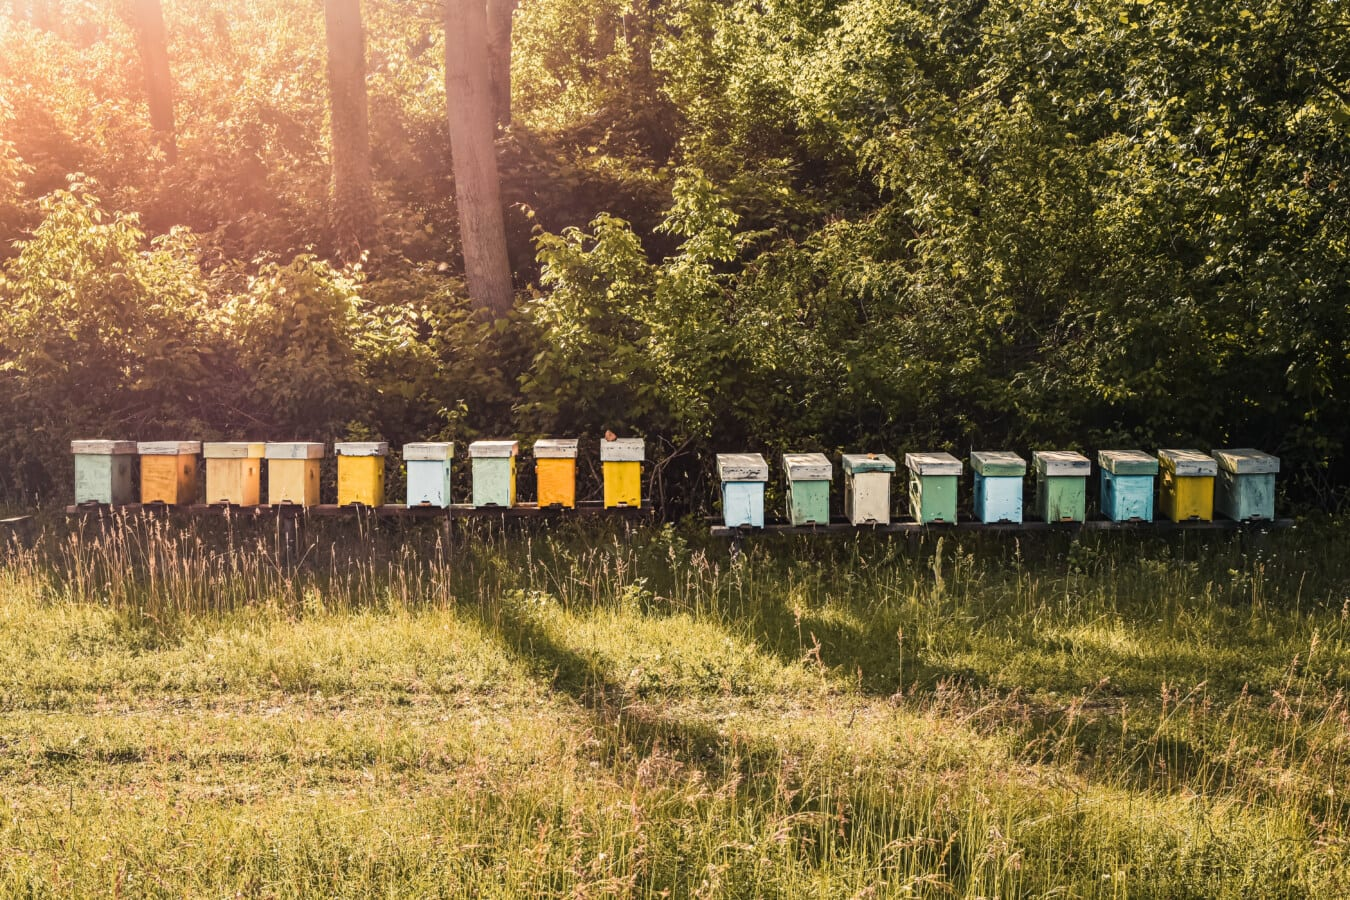 beehive, outdoor, farming, sunlight, summer season, rural, farm, agriculture, nature, grass